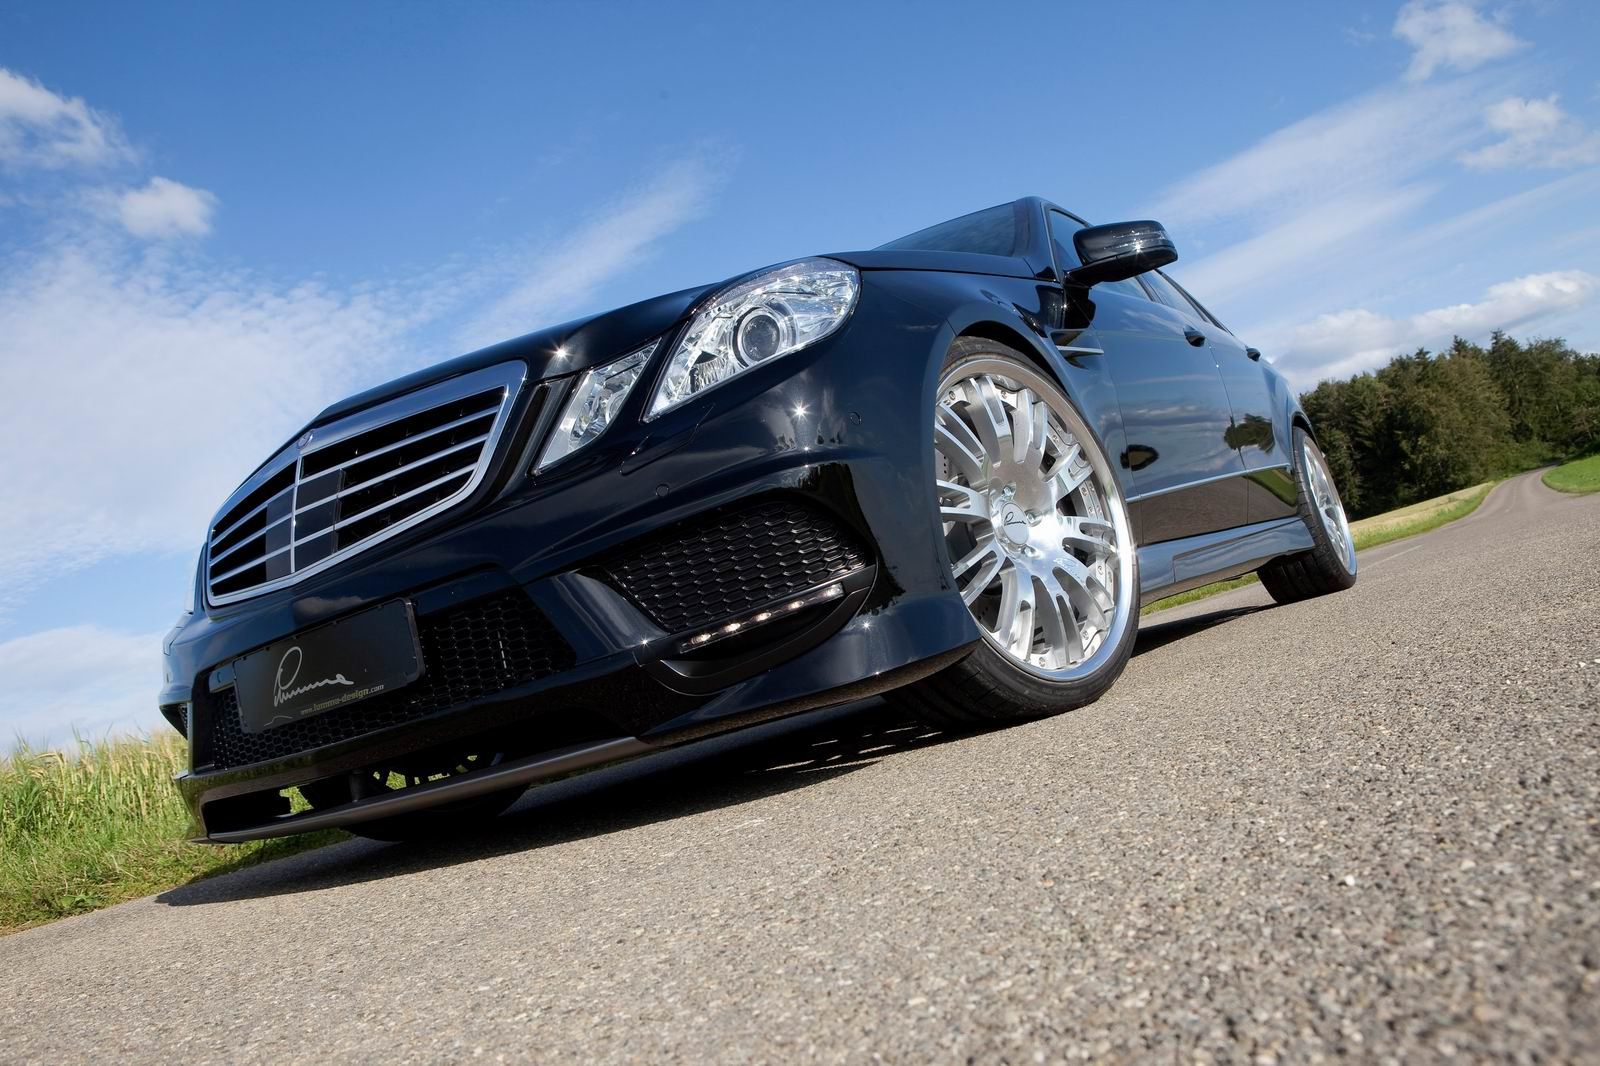 Mercedes Boom Wheel - Картинки, рисунки, фото, обои - Аватарки для